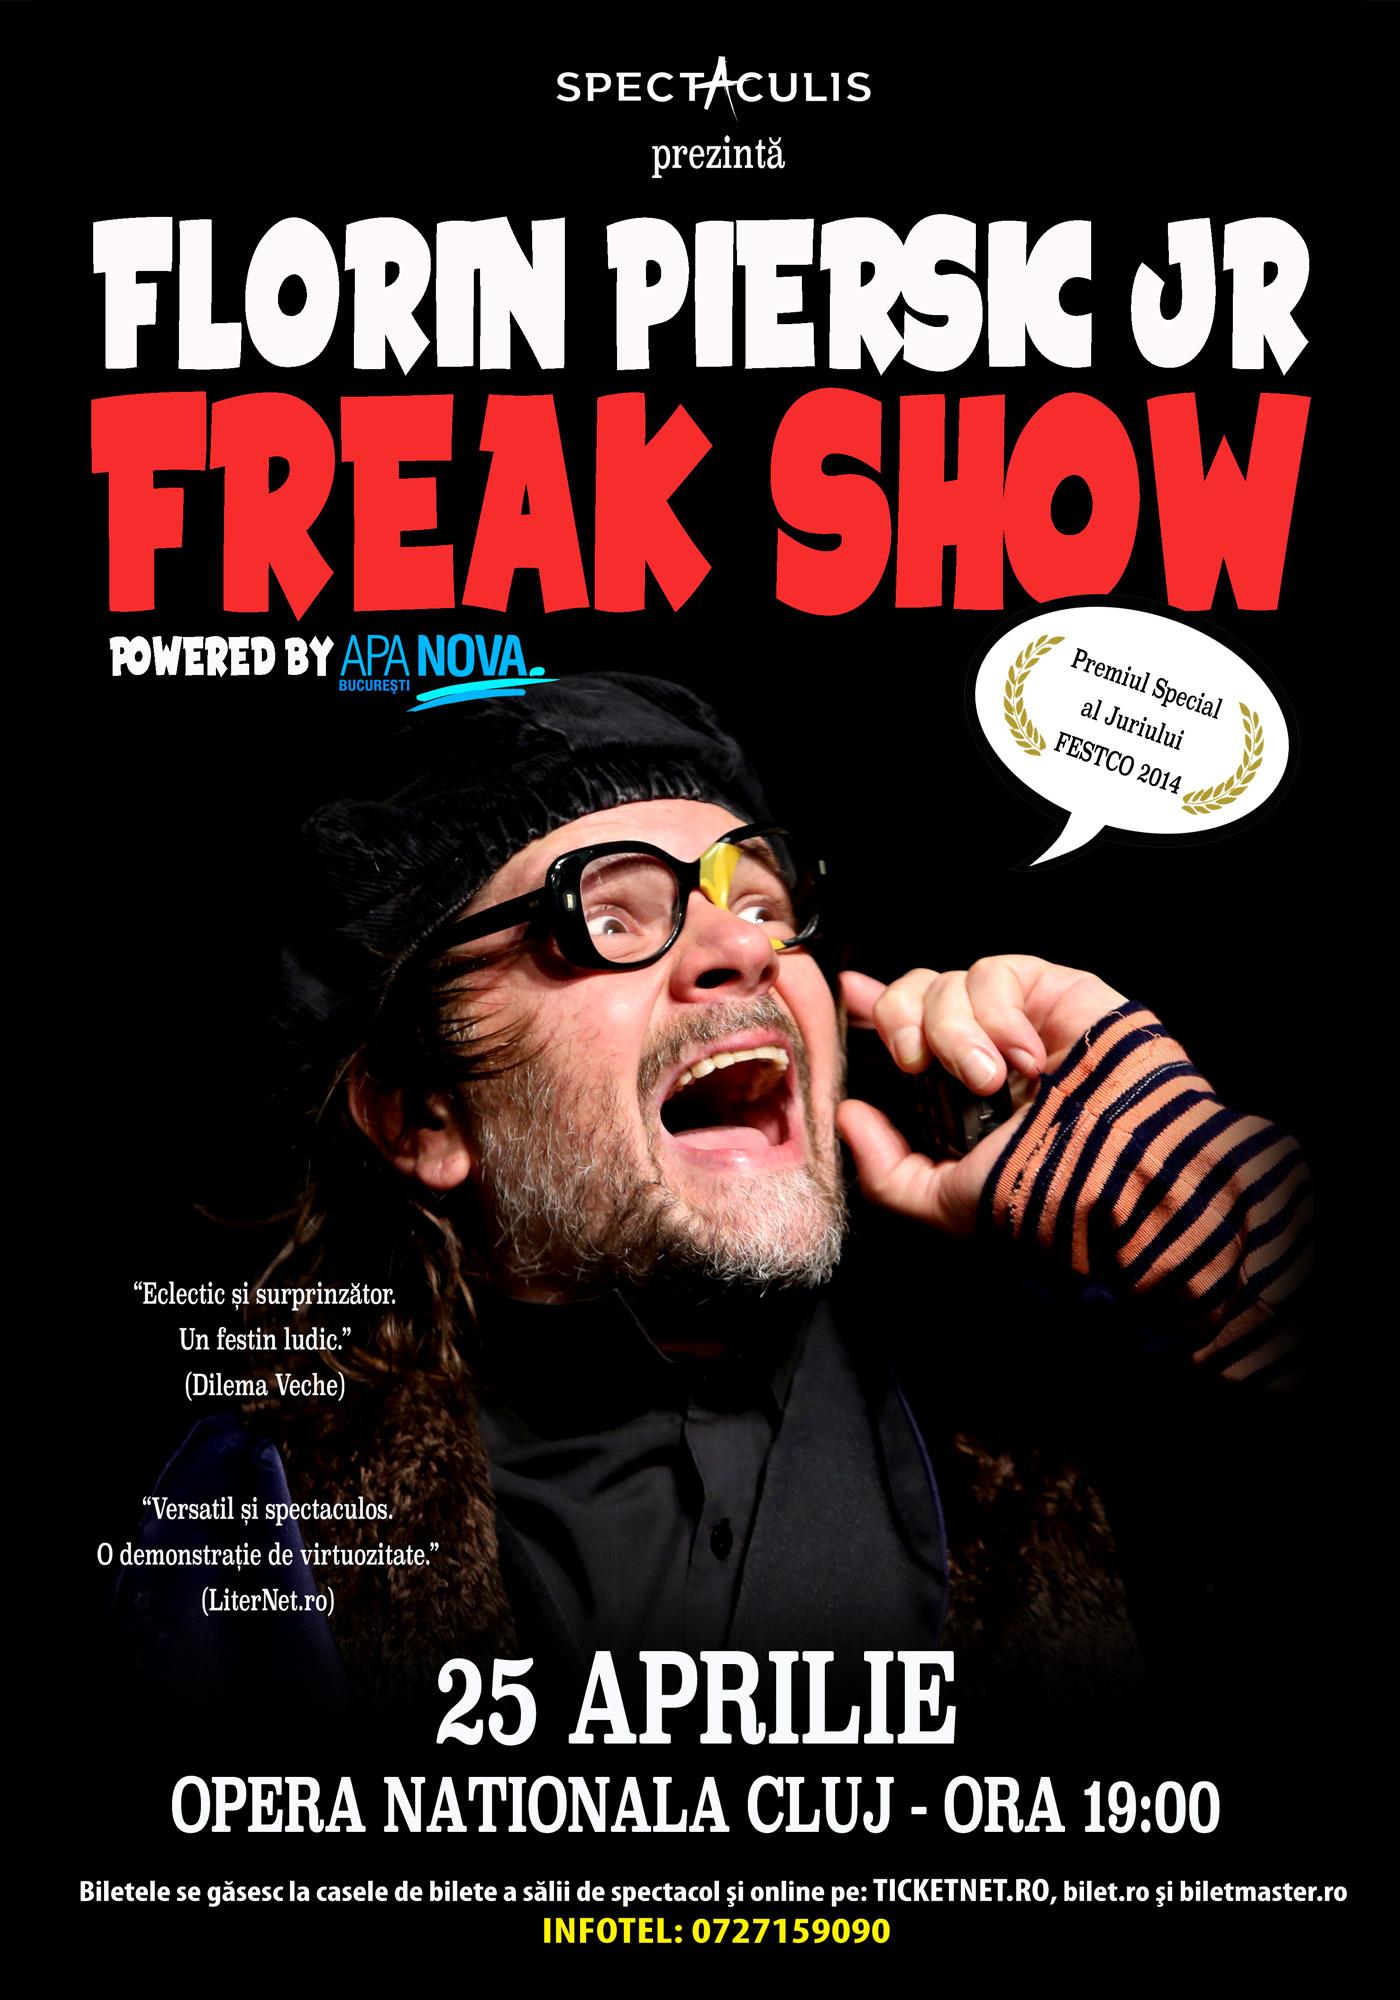 Florin Piersic jr. - Freak show (Cluj)